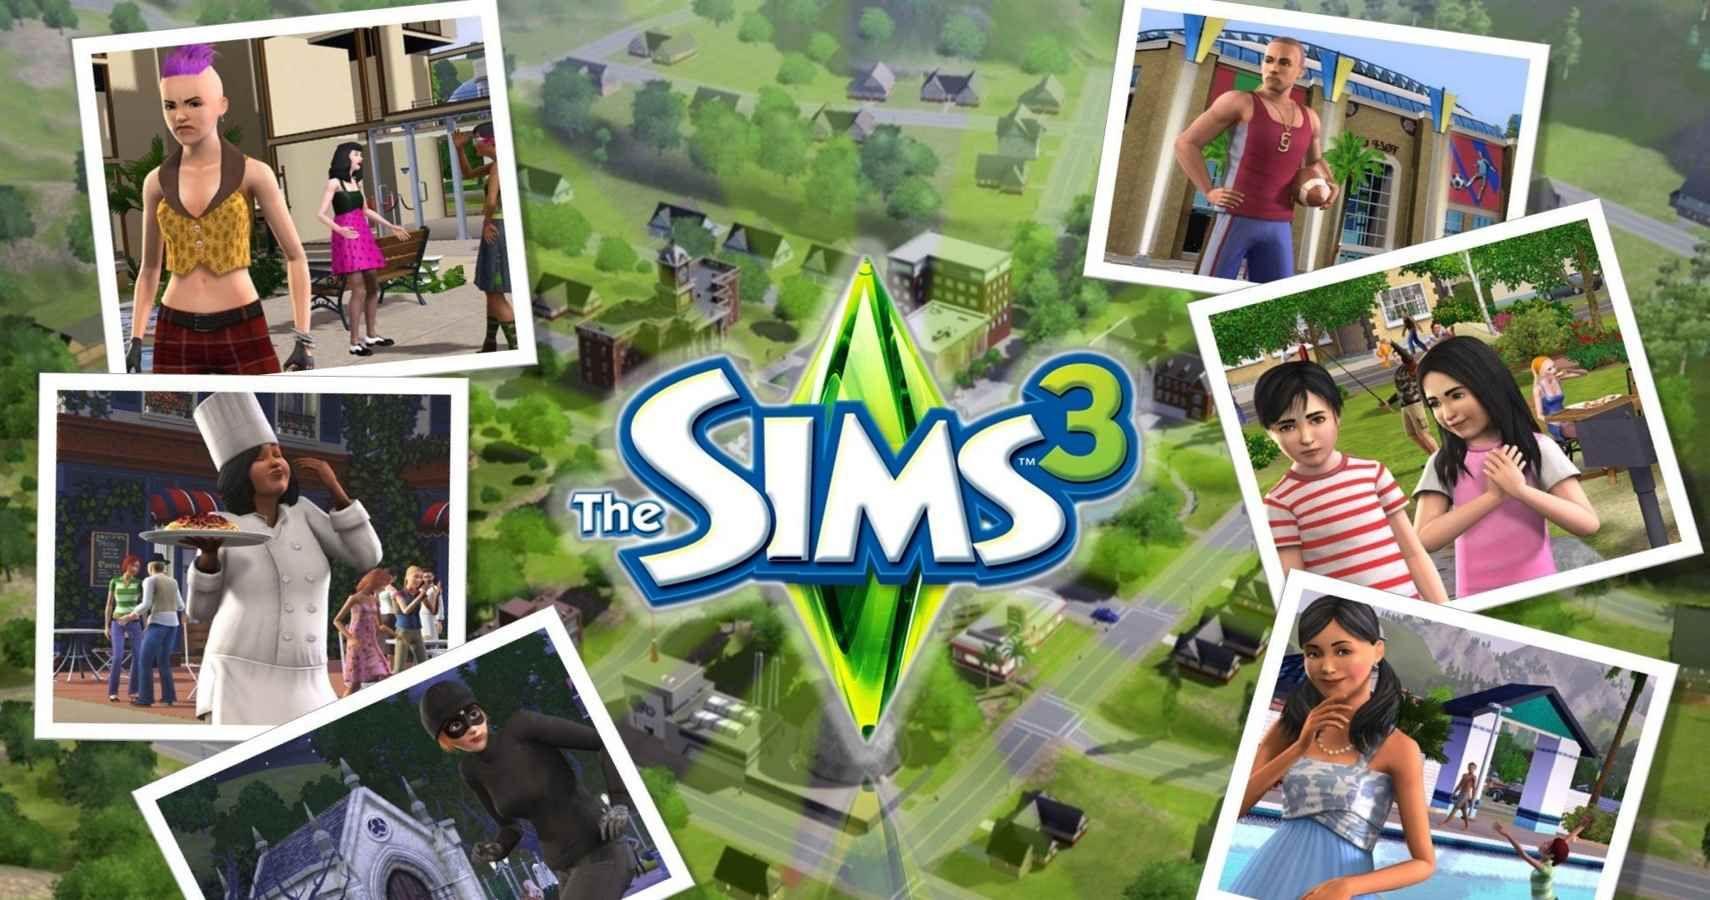 Sims 3 cheat codes